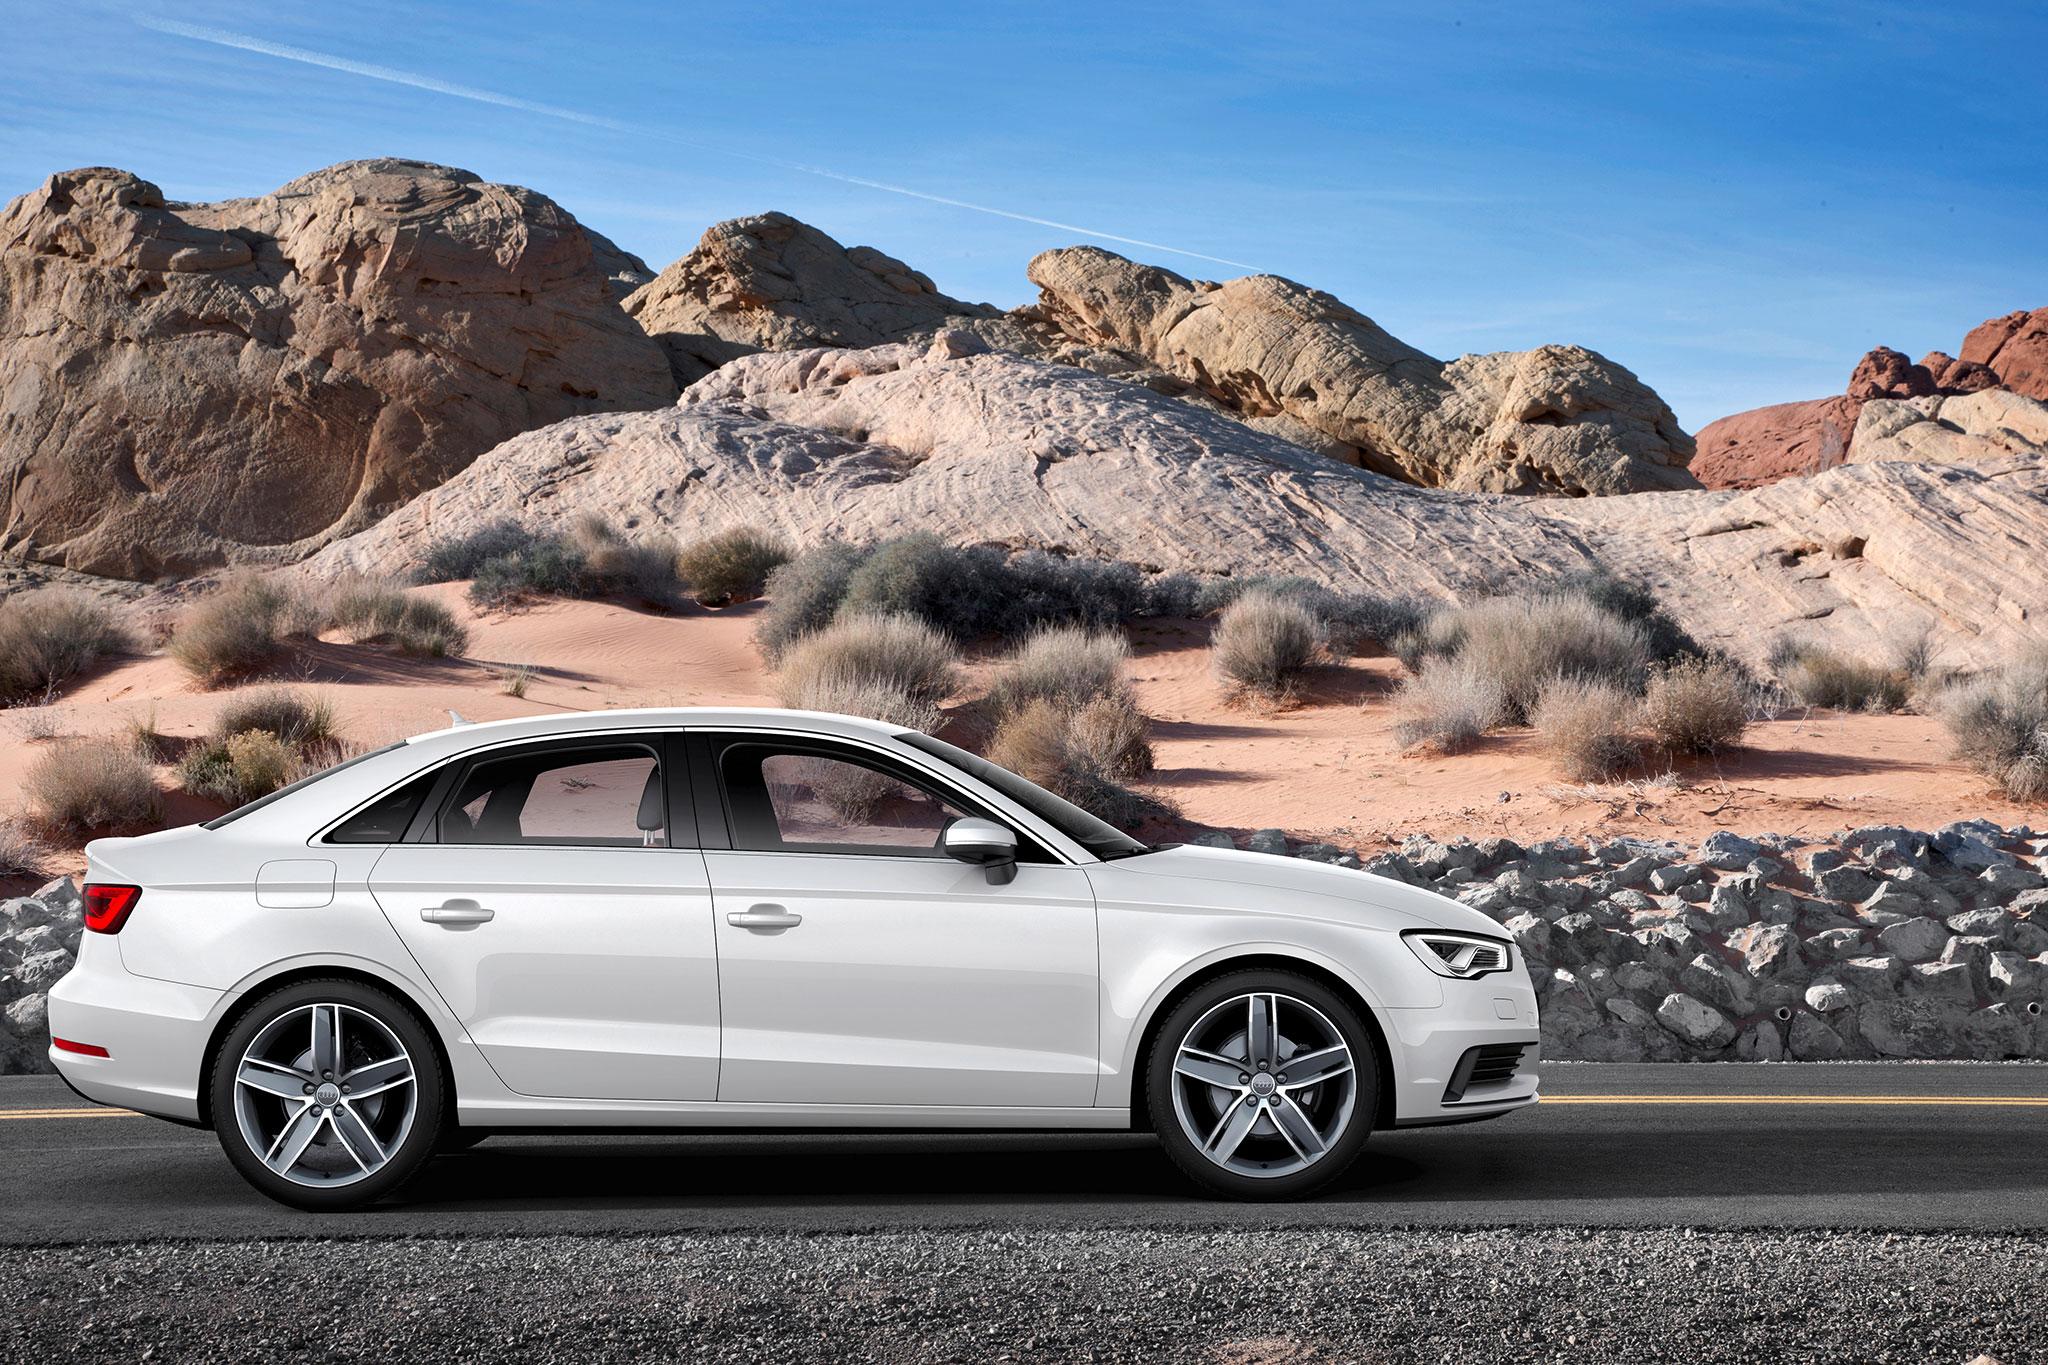 2015 audi a3 pricing and options list detailed automobile magazine 2015 audi a3 sedan altavistaventures Gallery